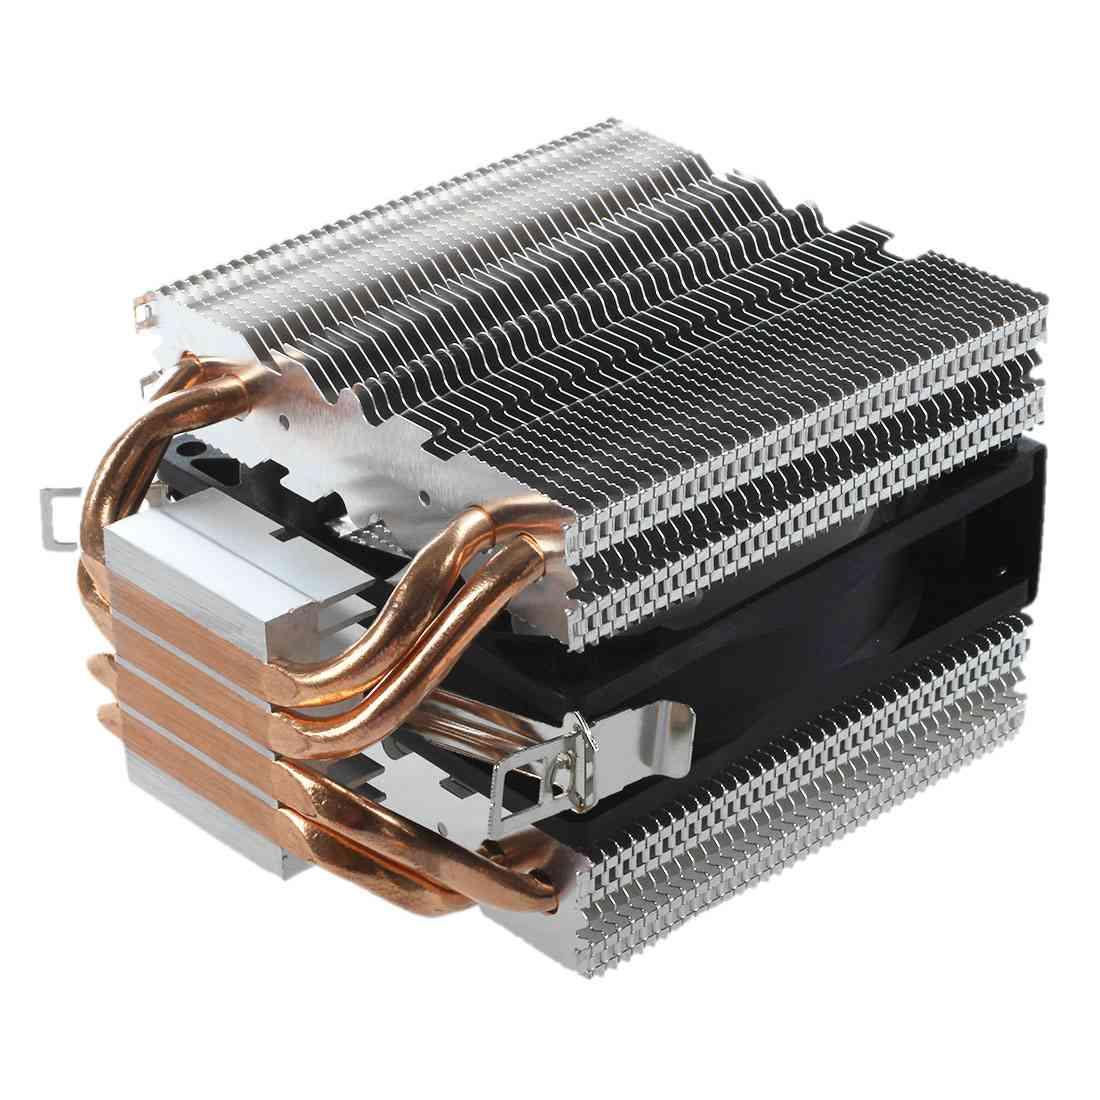 4 Heatpipe CPU Cooler Heat Sink for Intel LGA 1150 1151 1155 775 1156 New процессор intel pentium g620 cpu 1155 h61